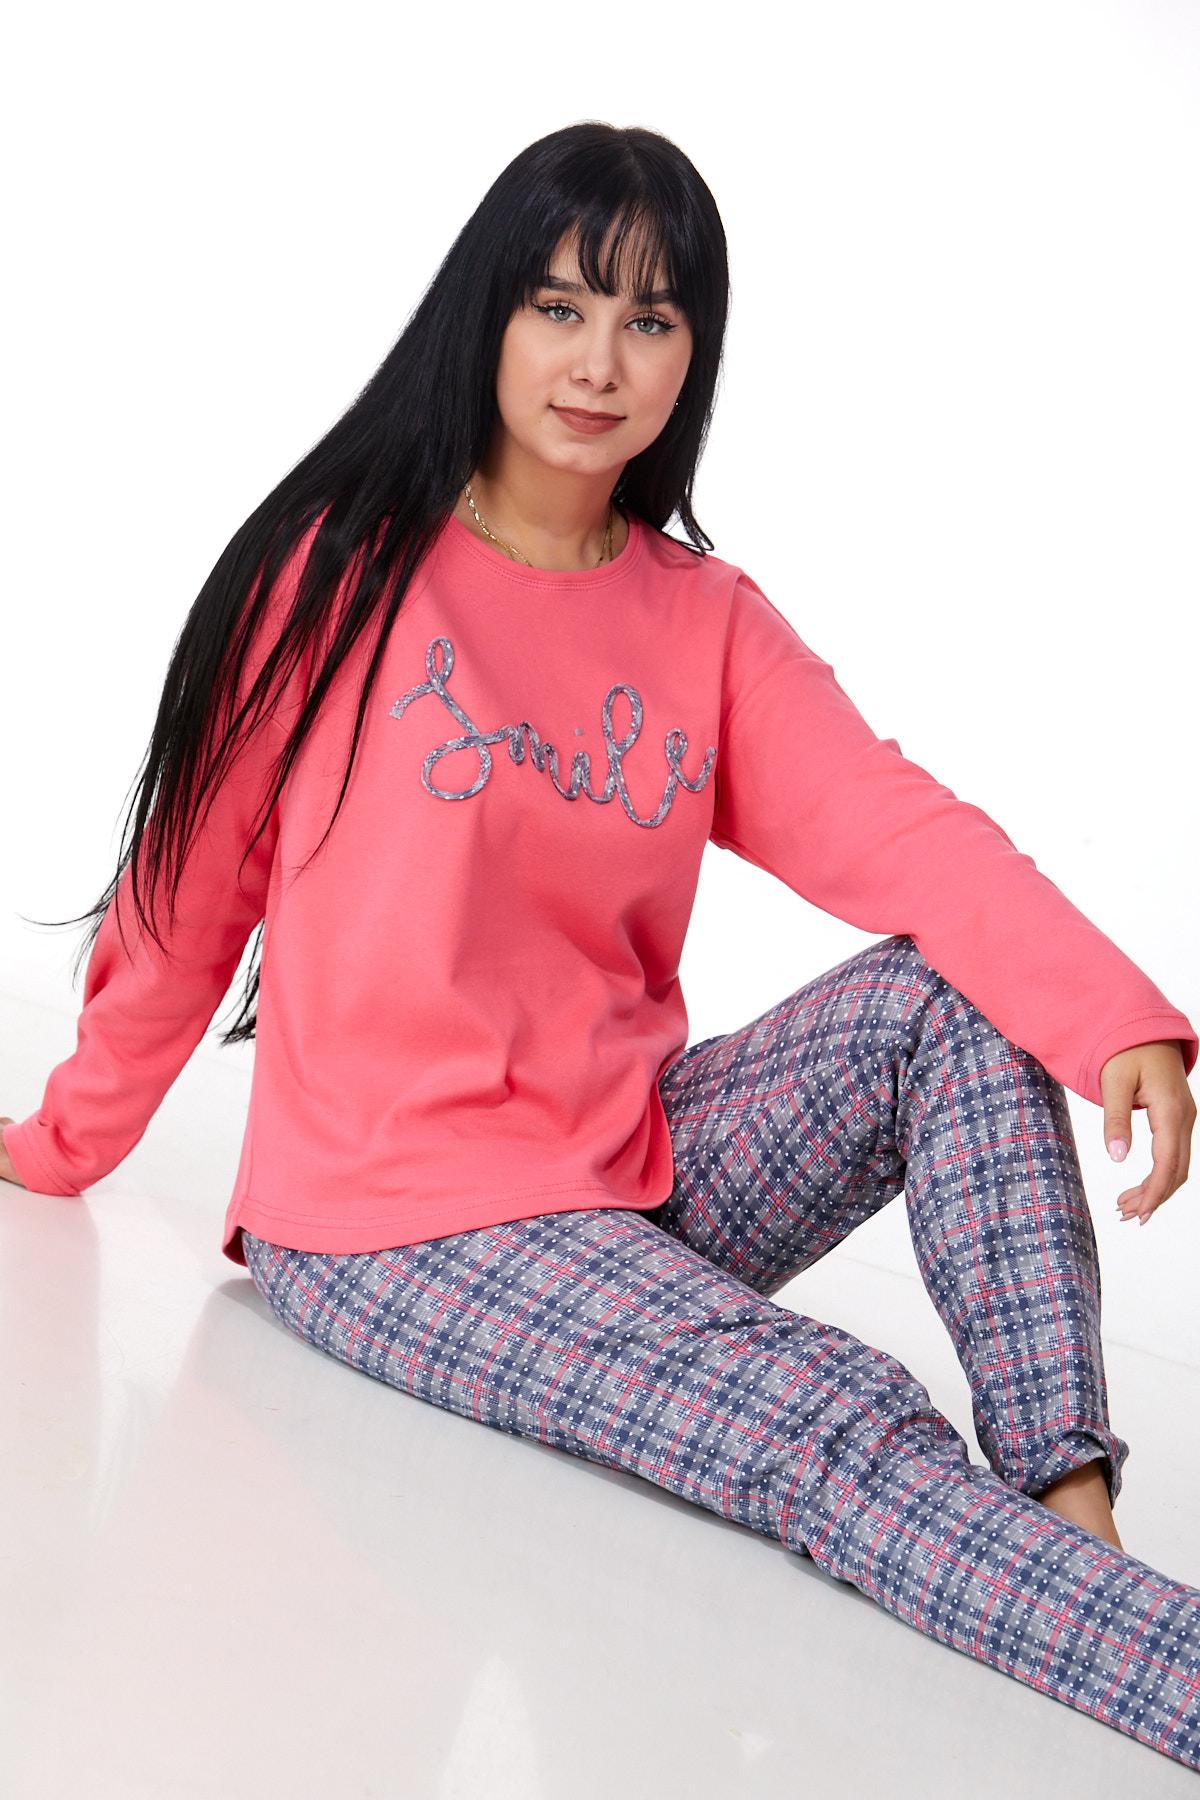 Dámské pyžamo comfort teplé 1B0978